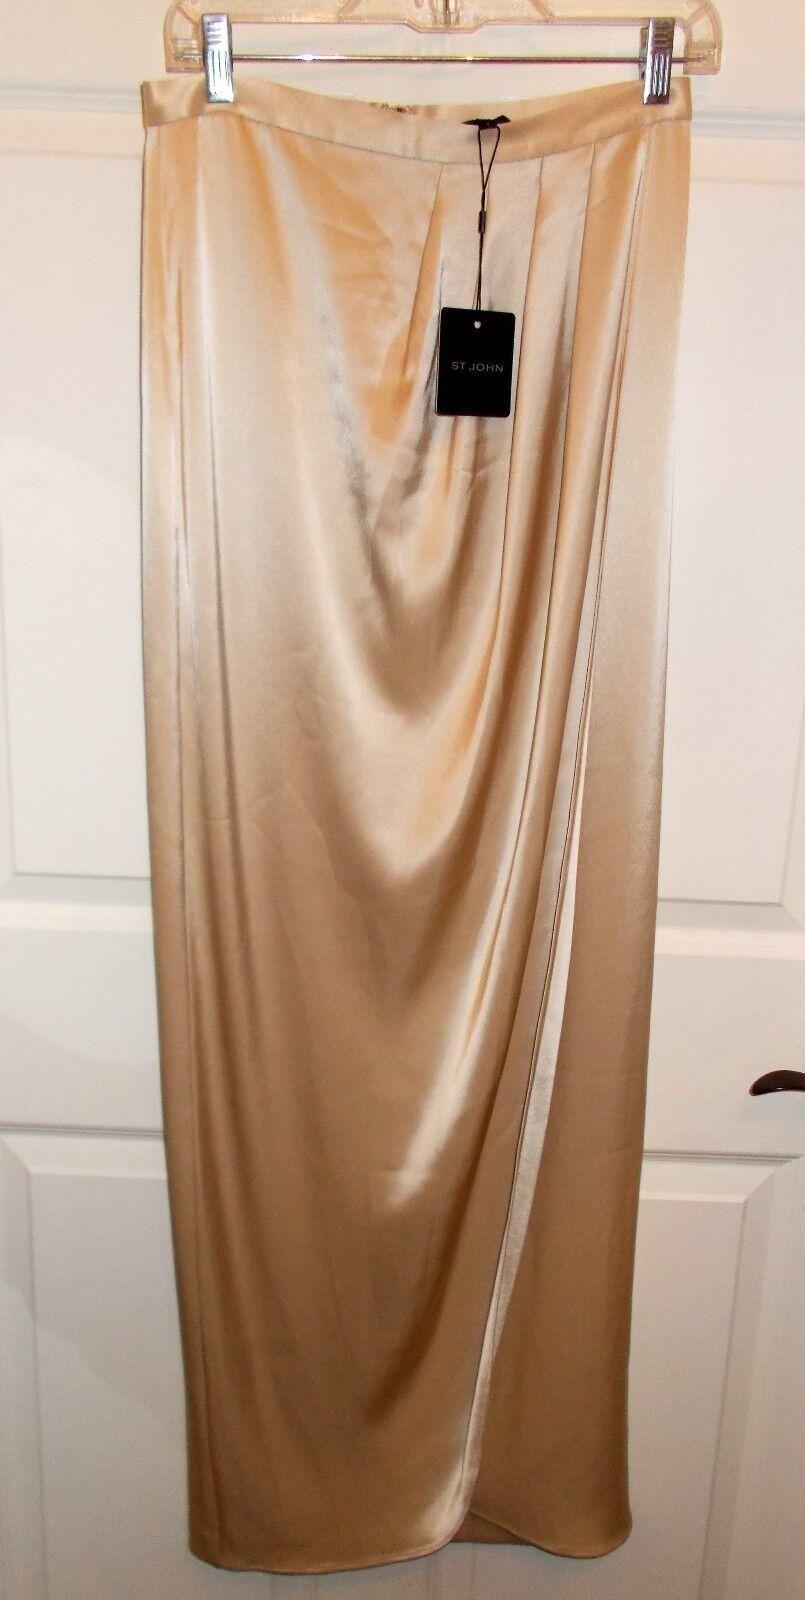 NWT ST. John Champagne Satin Long Evening Skirt Sz 4